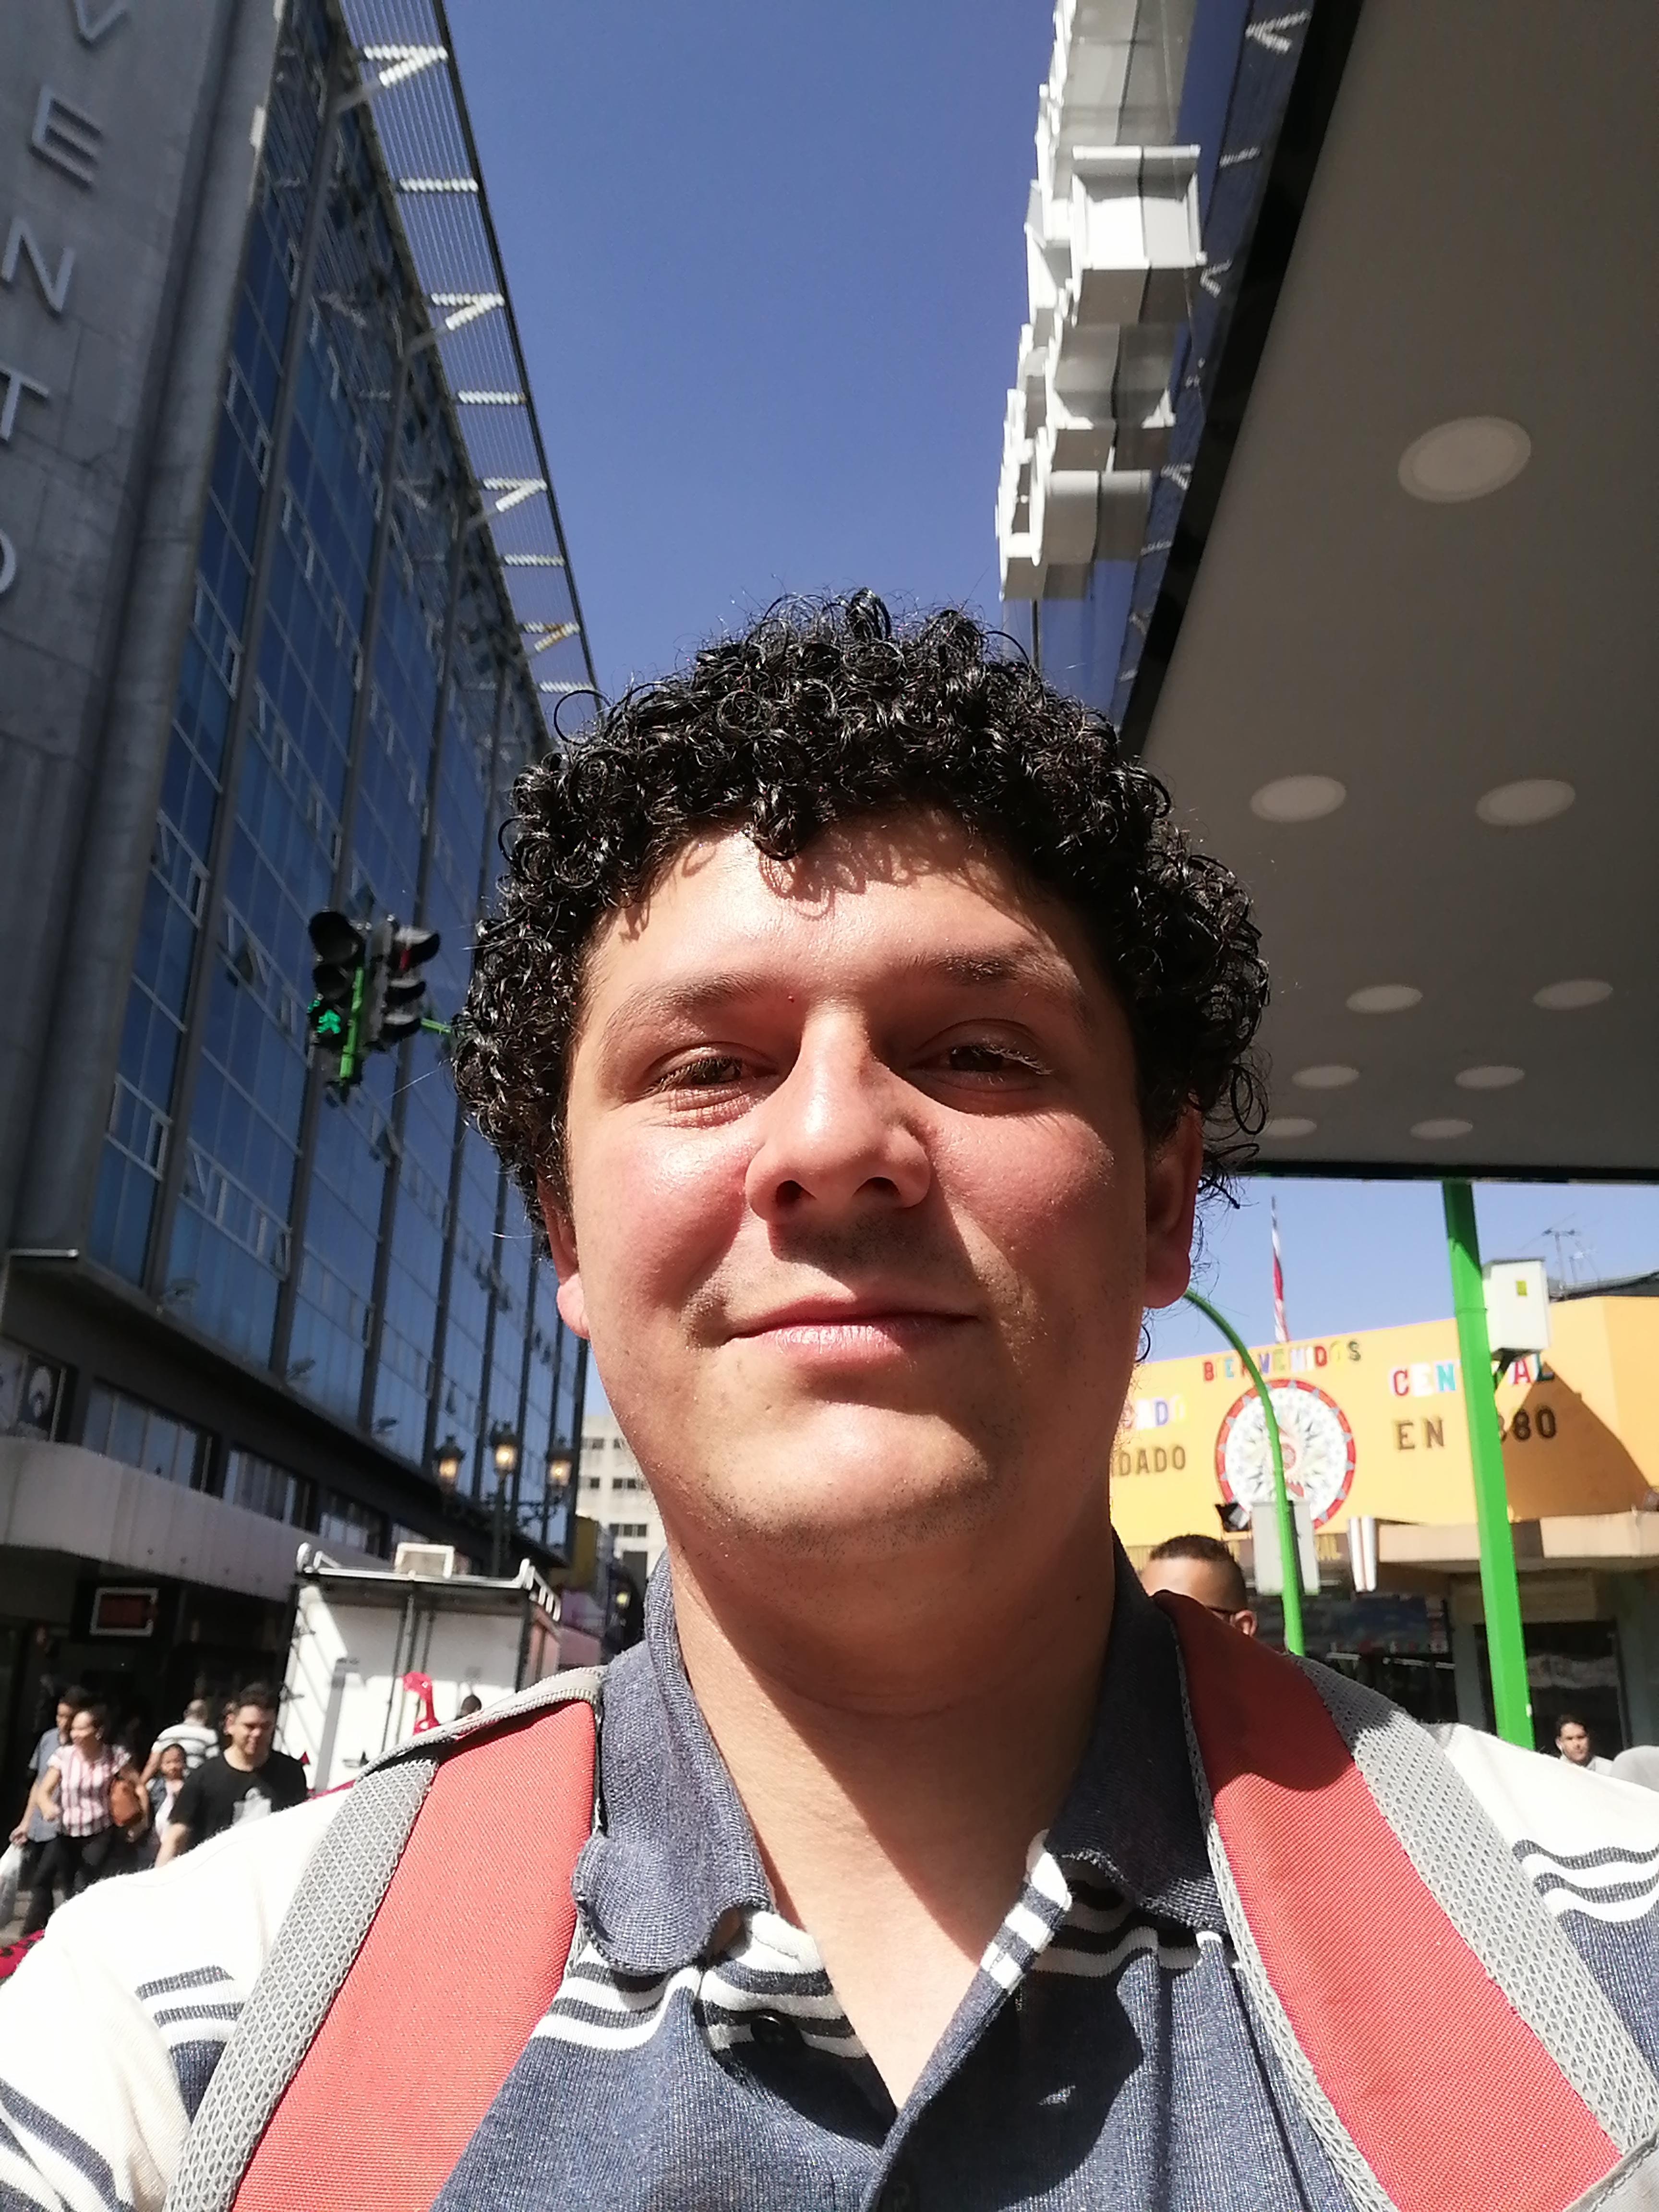 Randall Astorga Agüero